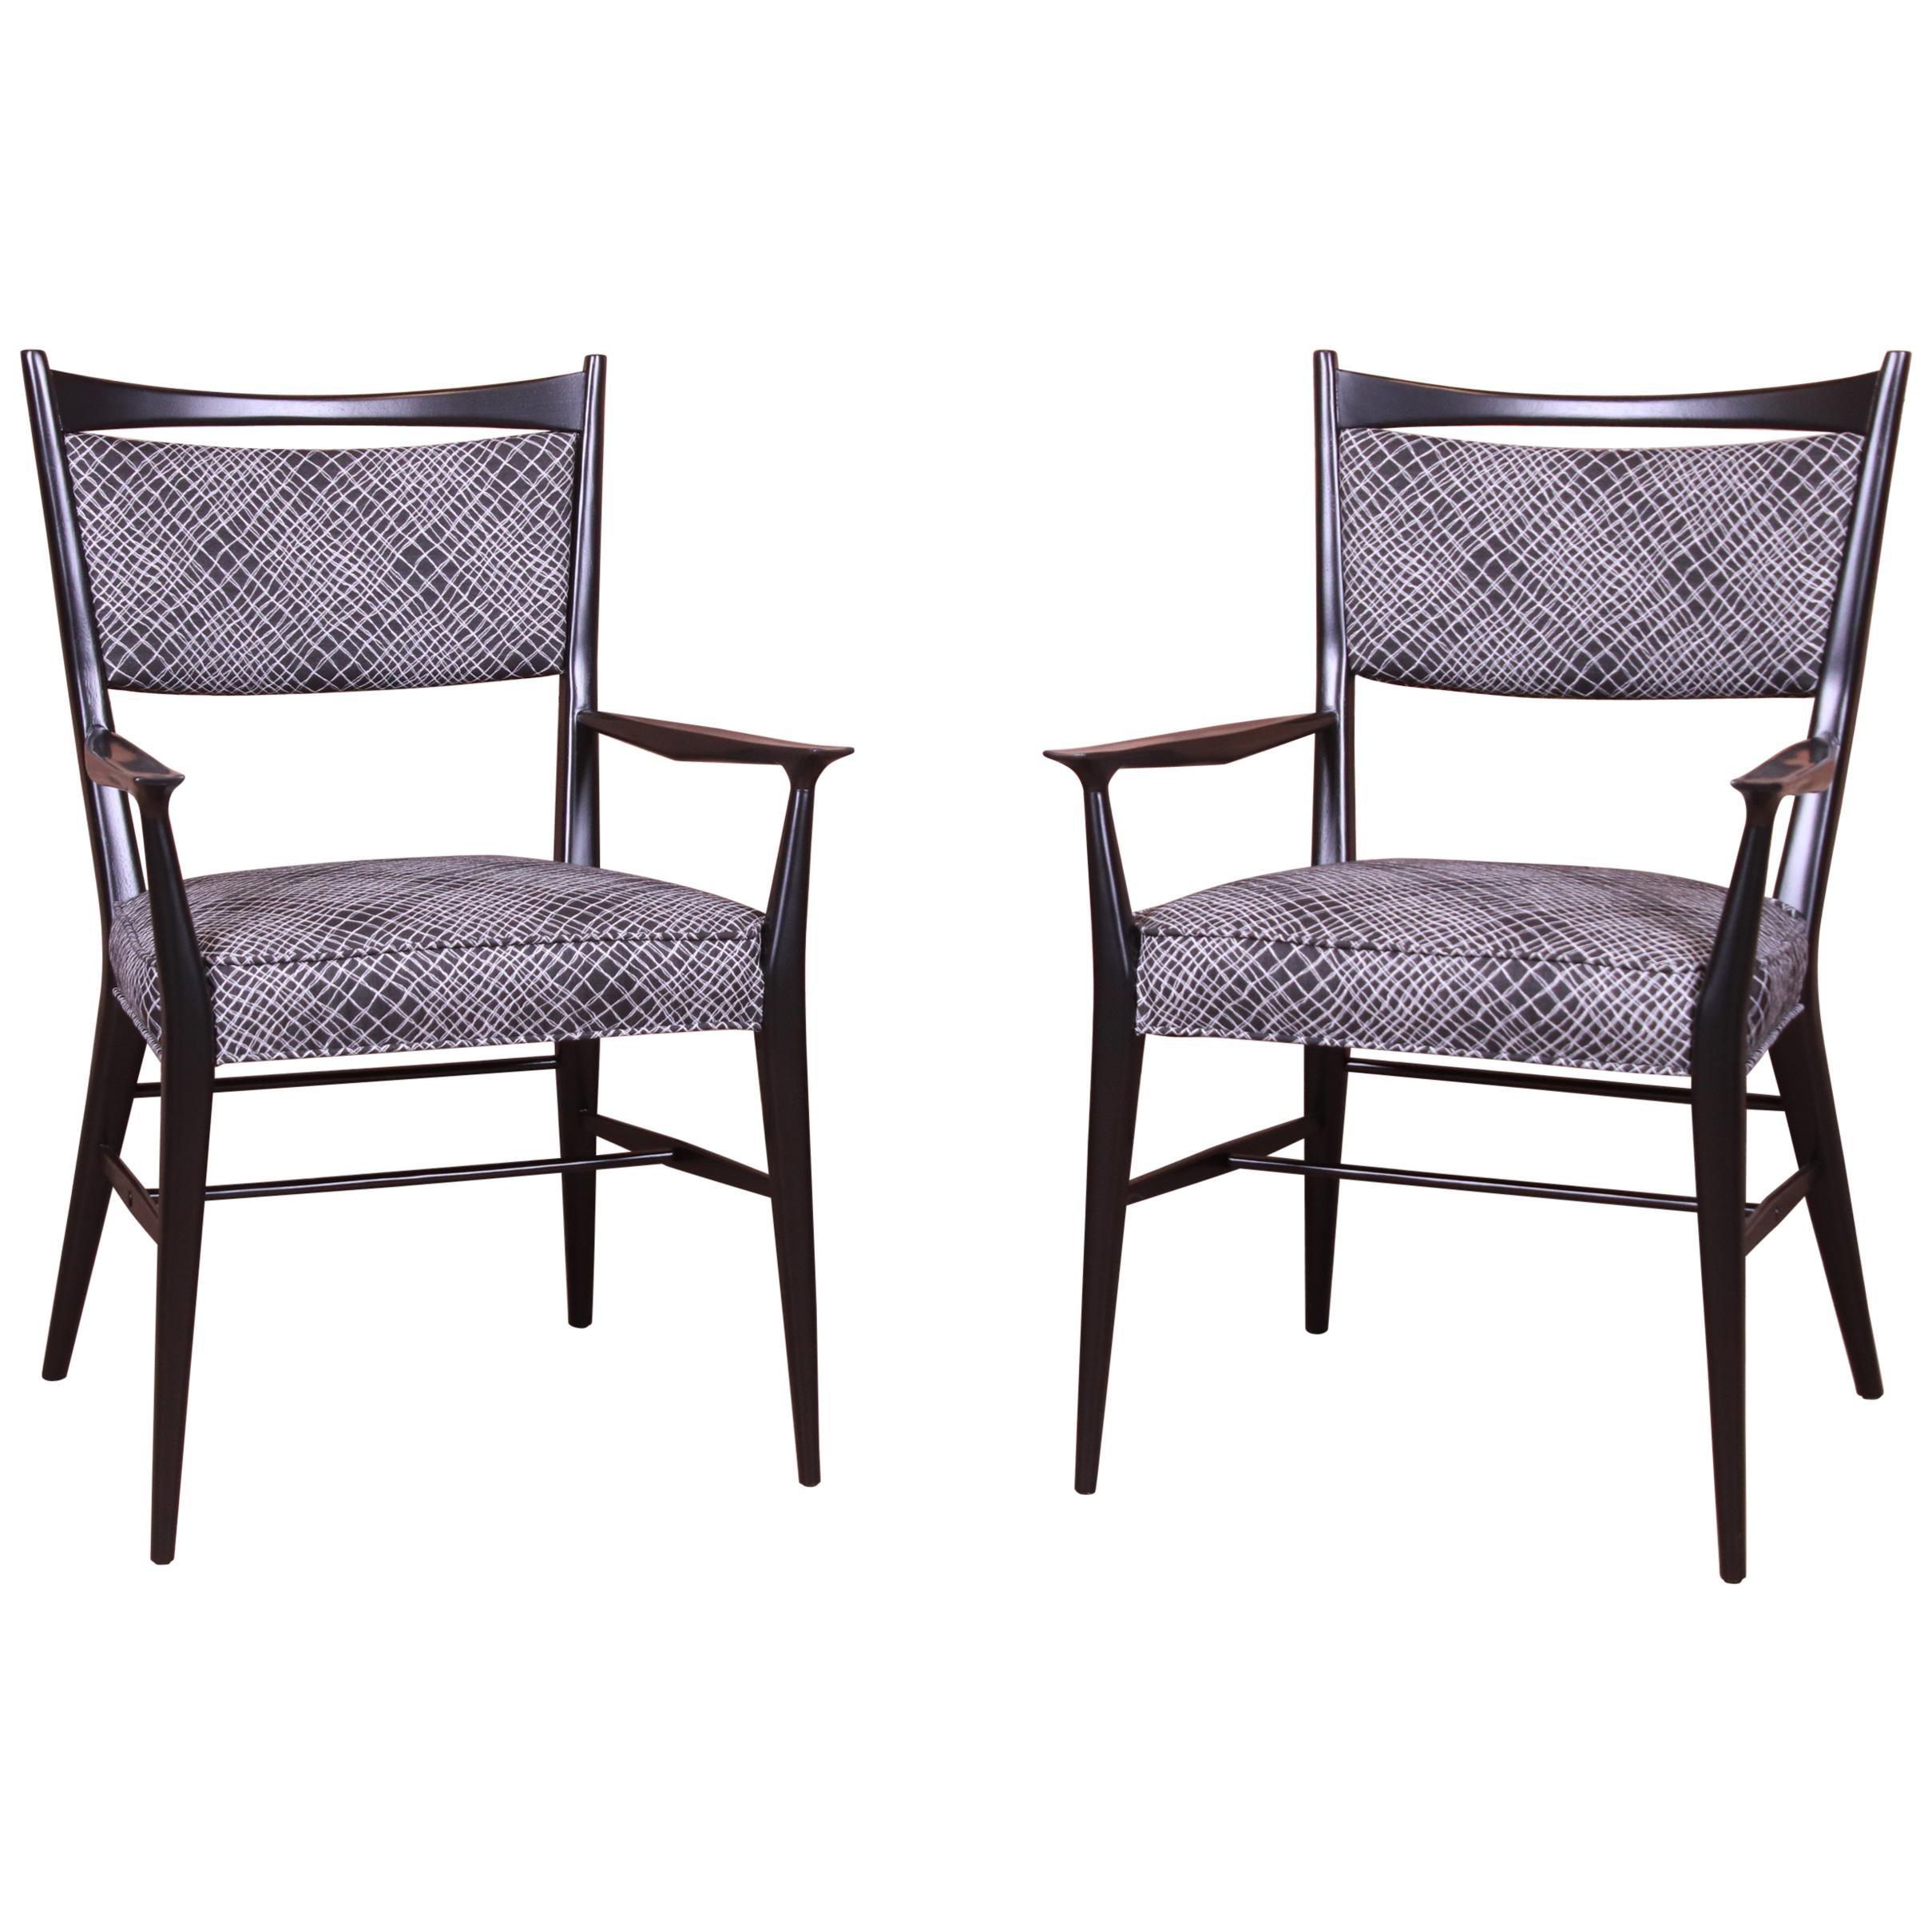 Paul McCobb for Calvin Mid-Century Modern Black Lacquered Armchairs, Pair